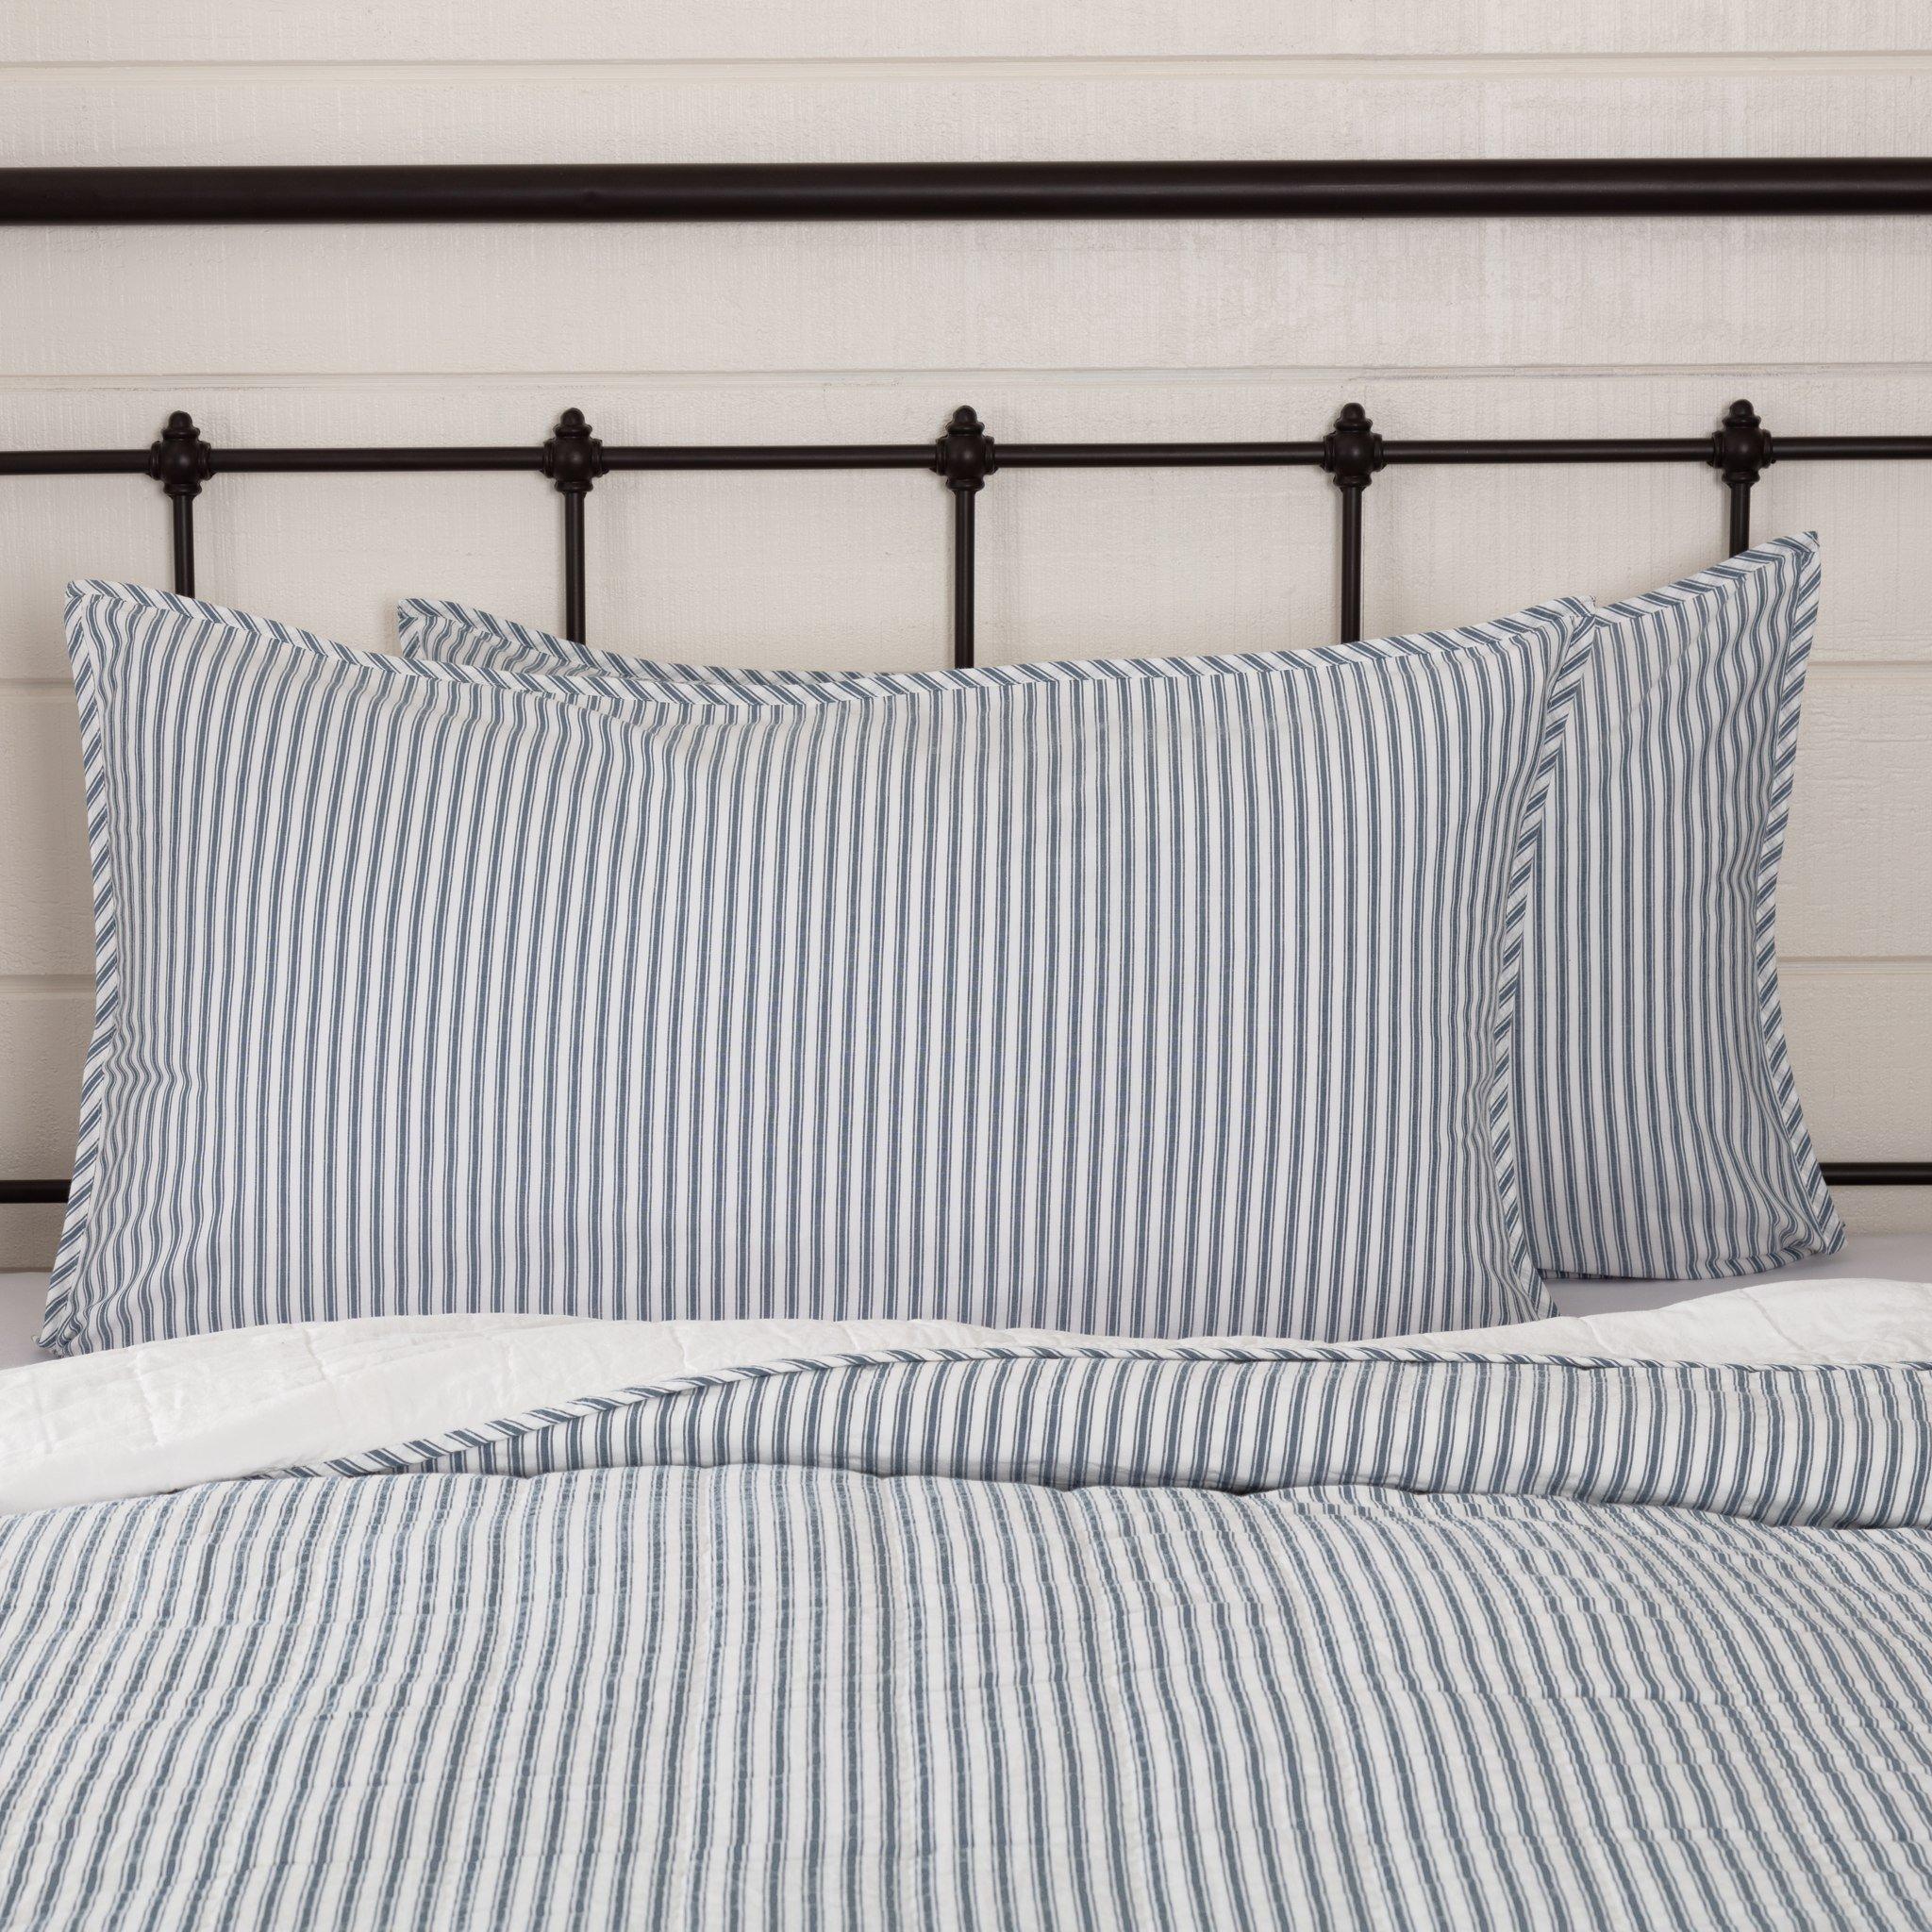 Sawyer Mill Blue Ticking Stripe King Sham 21x37 Ticking Stripe Ticking Stripe Bedding Farmhouse Bedding